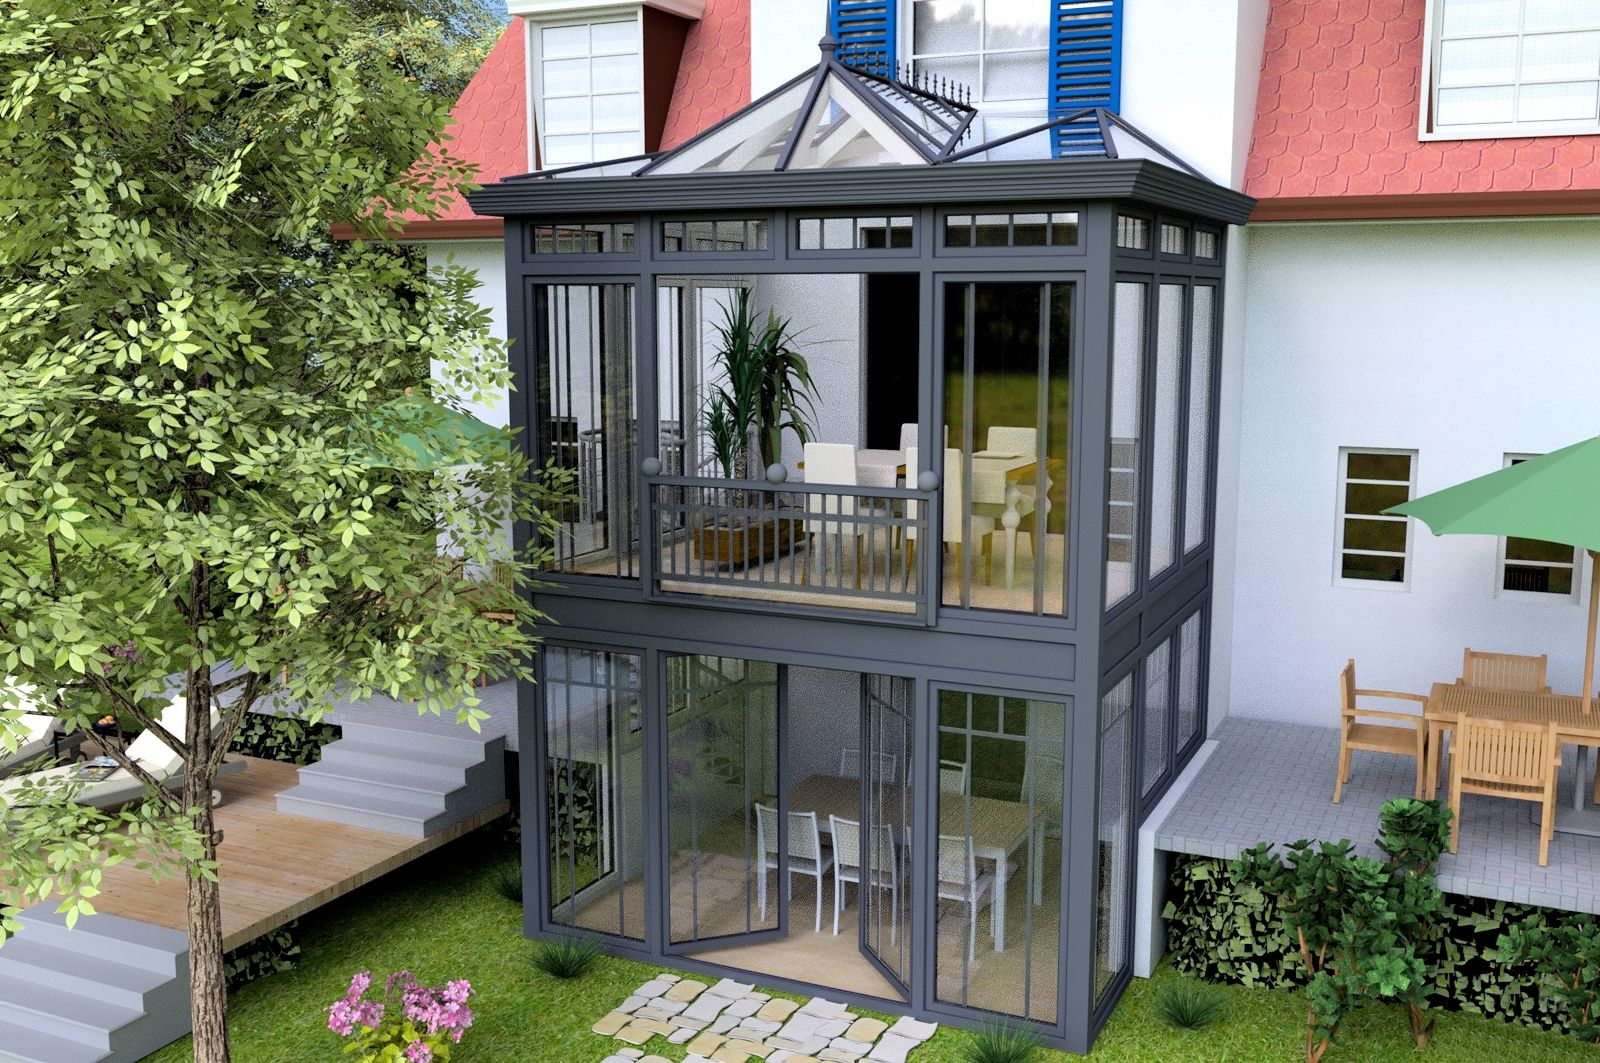 Das w re der absolute idealfall - Extension maison verriere ...